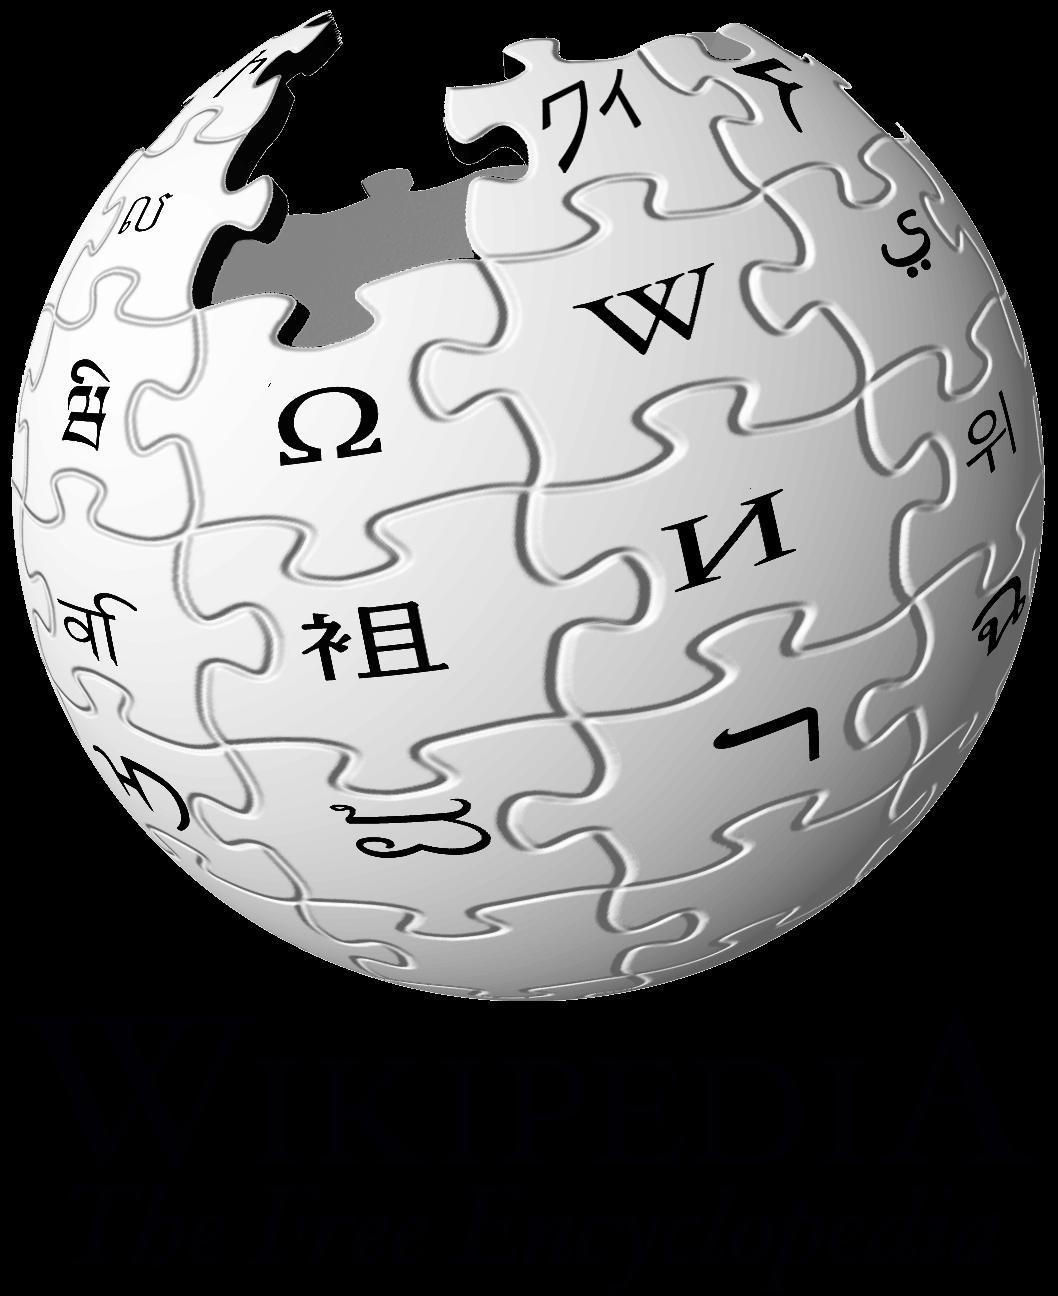 Educational Technology Online Learning Insights Circle Diagram Wikipedia The Free Encyclopedia Logo En Big